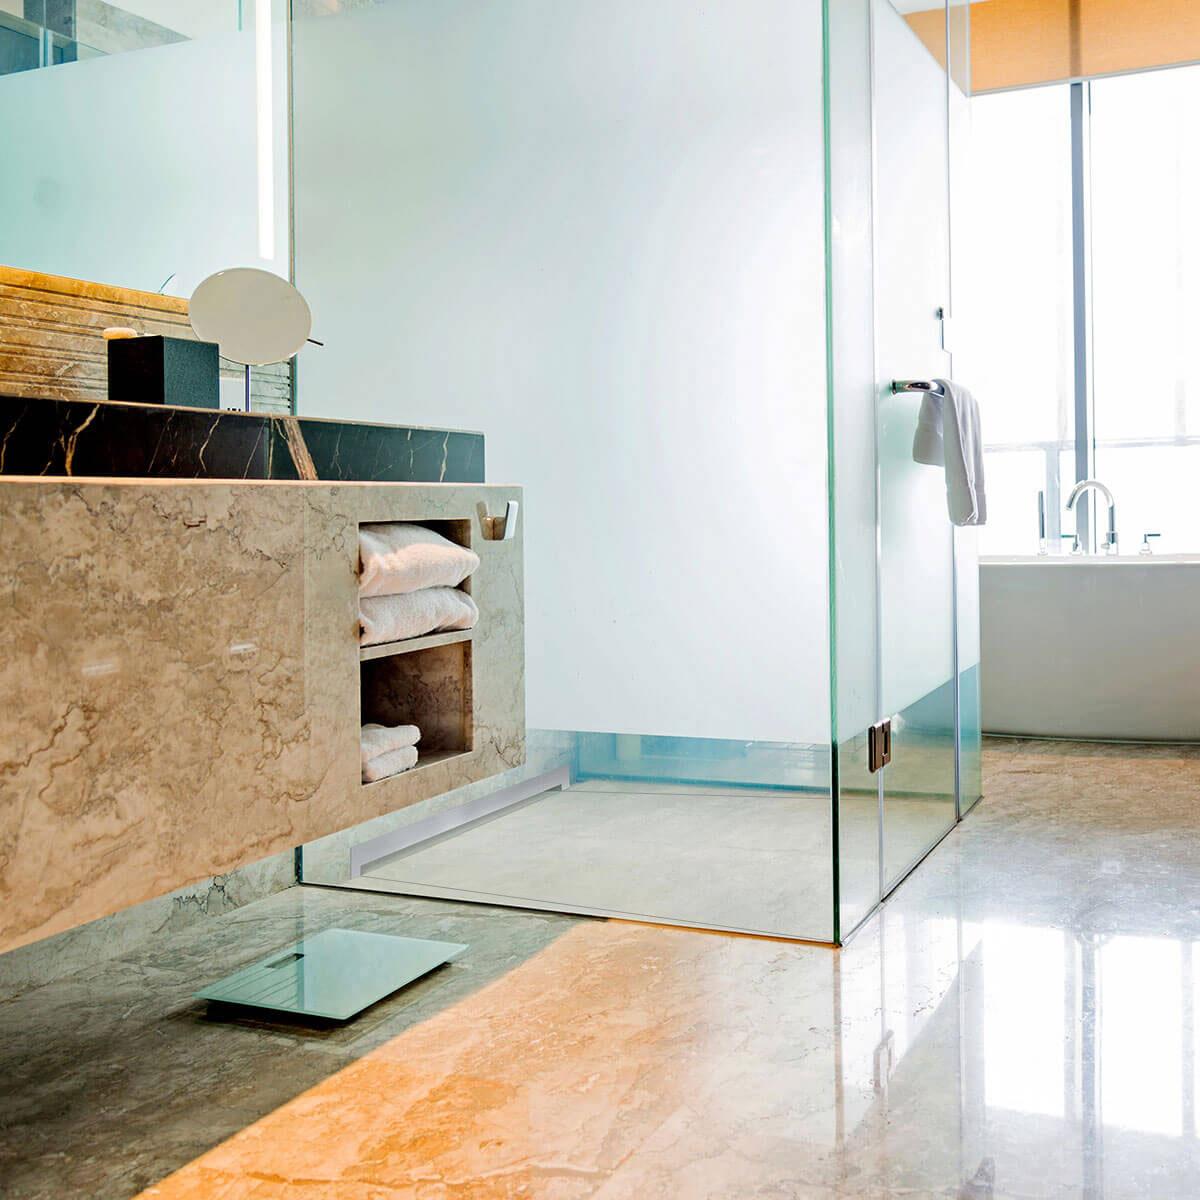 dusche bad duschelement duschboard wandablauf duschtasse befliesbar bodeneben ebay. Black Bedroom Furniture Sets. Home Design Ideas